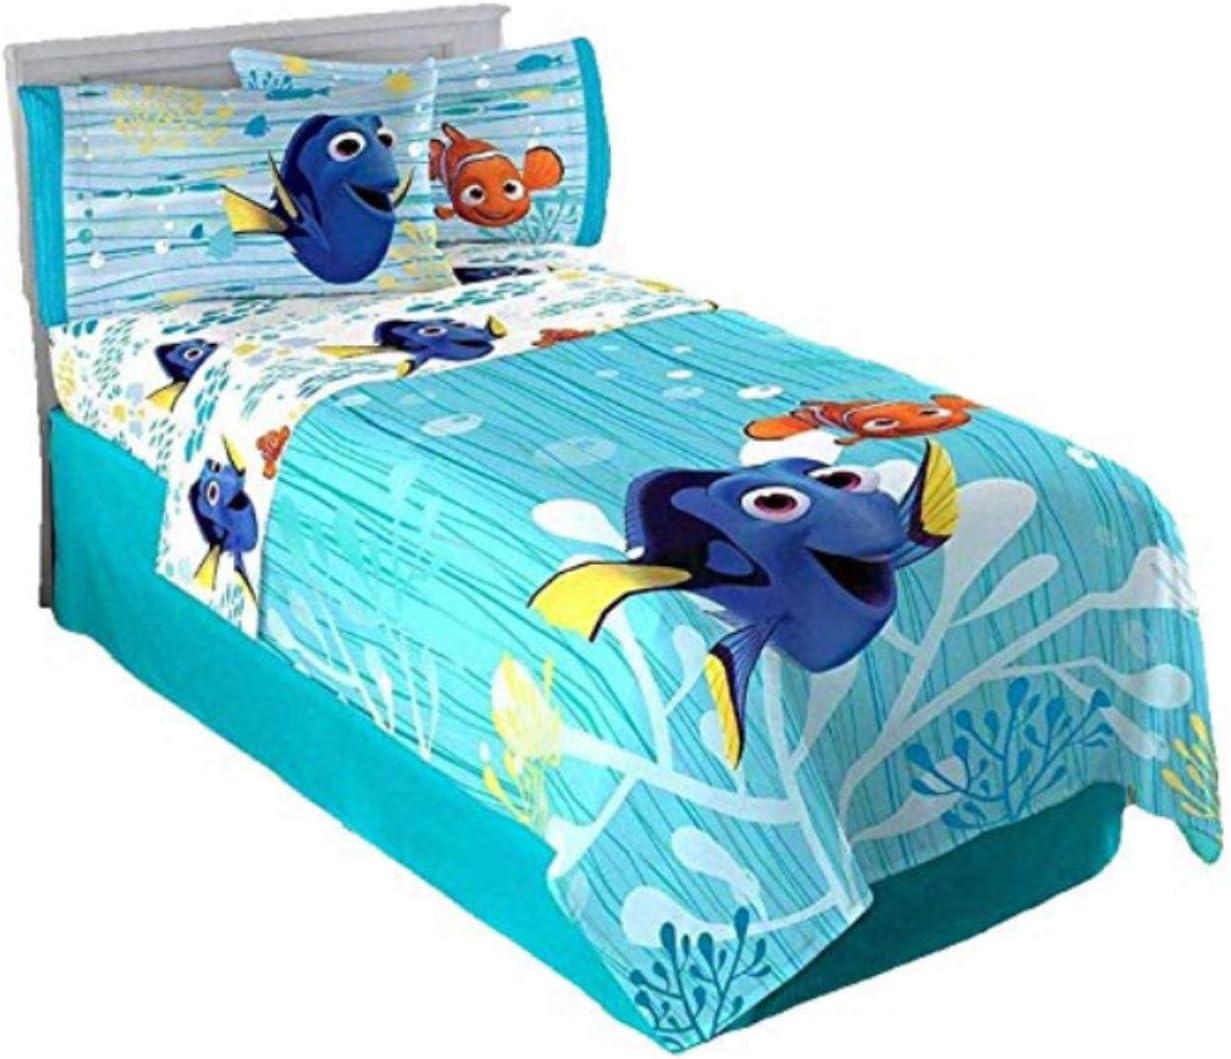 Disney Pixar Finding Dory 3 Piece Twin Sheet Set